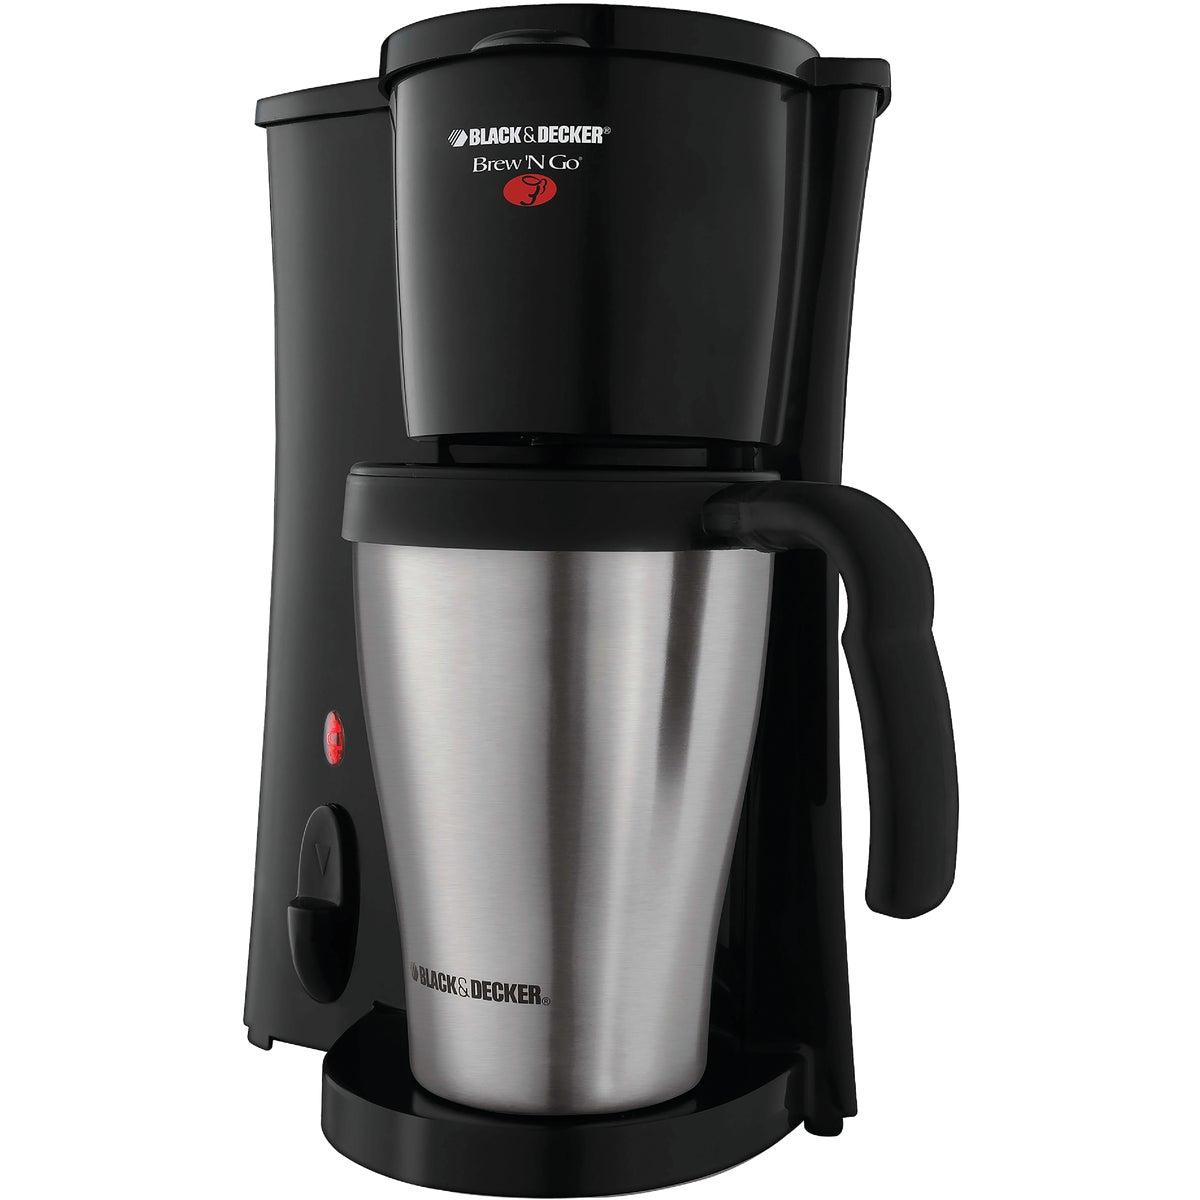 Spectrum Brands/Black & Decker Black & Decker Brew N' Go Personal Coffeemaker With Travel Mug at Sears.com